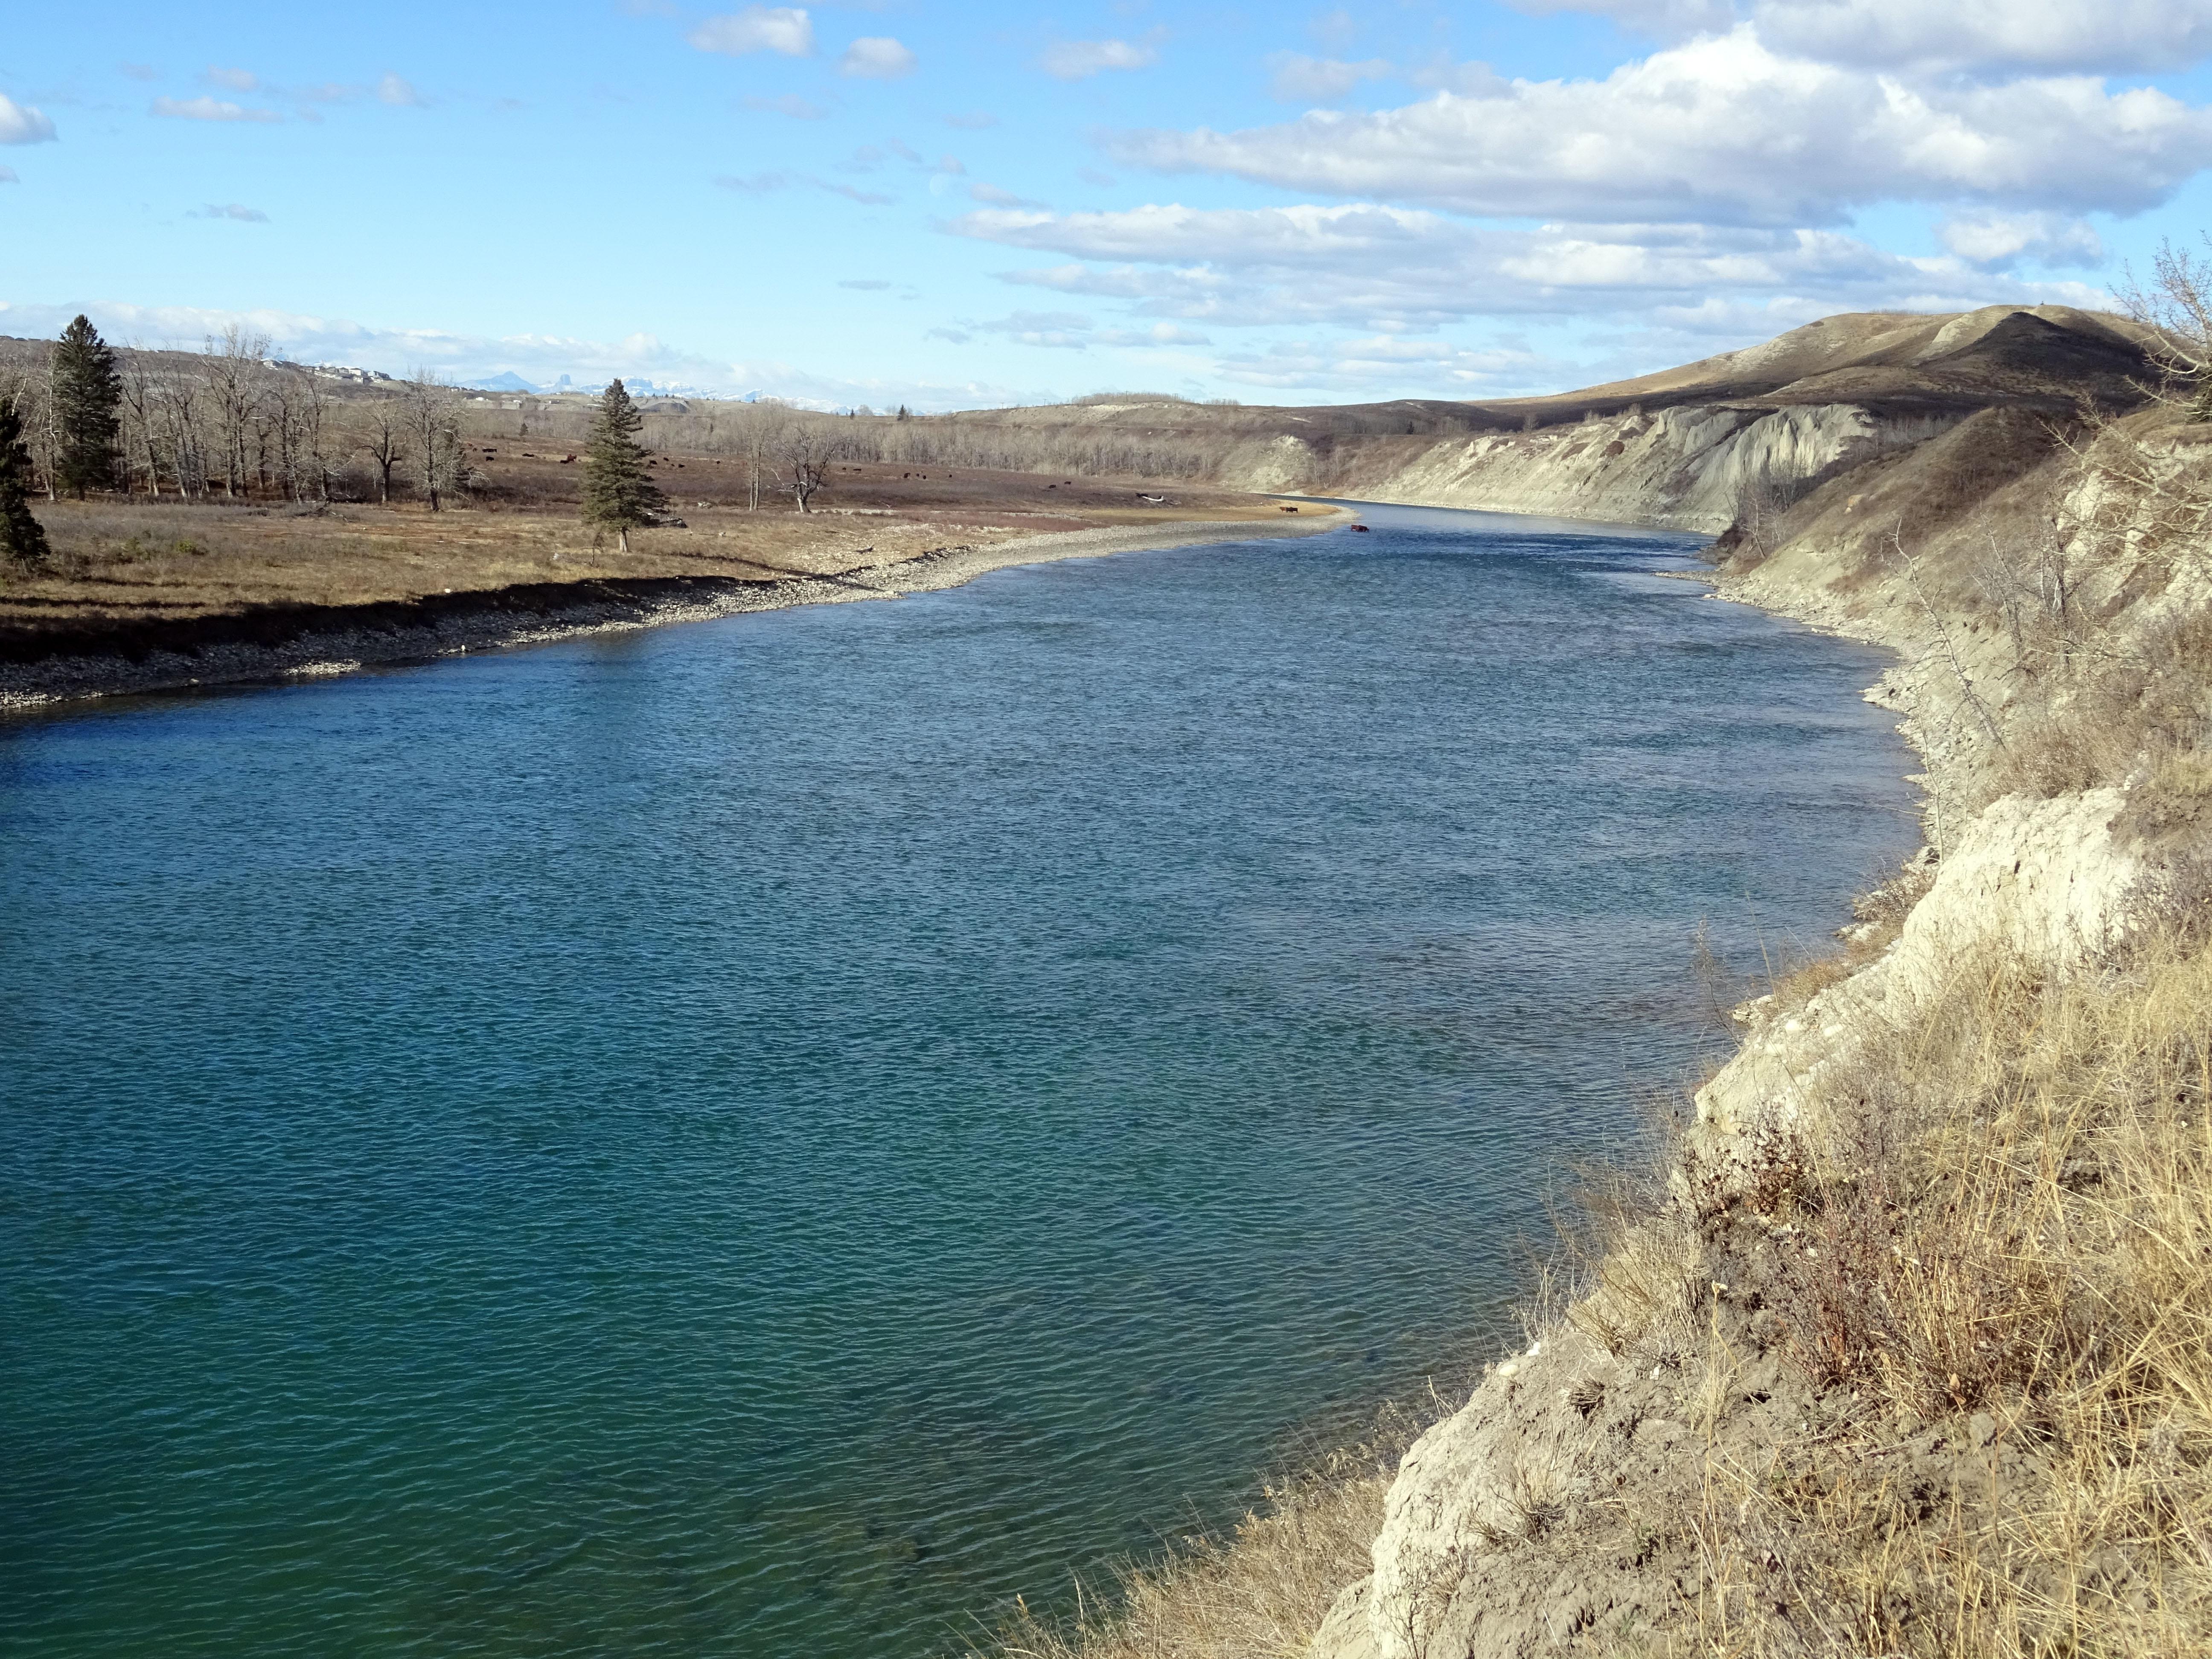 Parc provincial glenvow ranch, Alberta, Canada